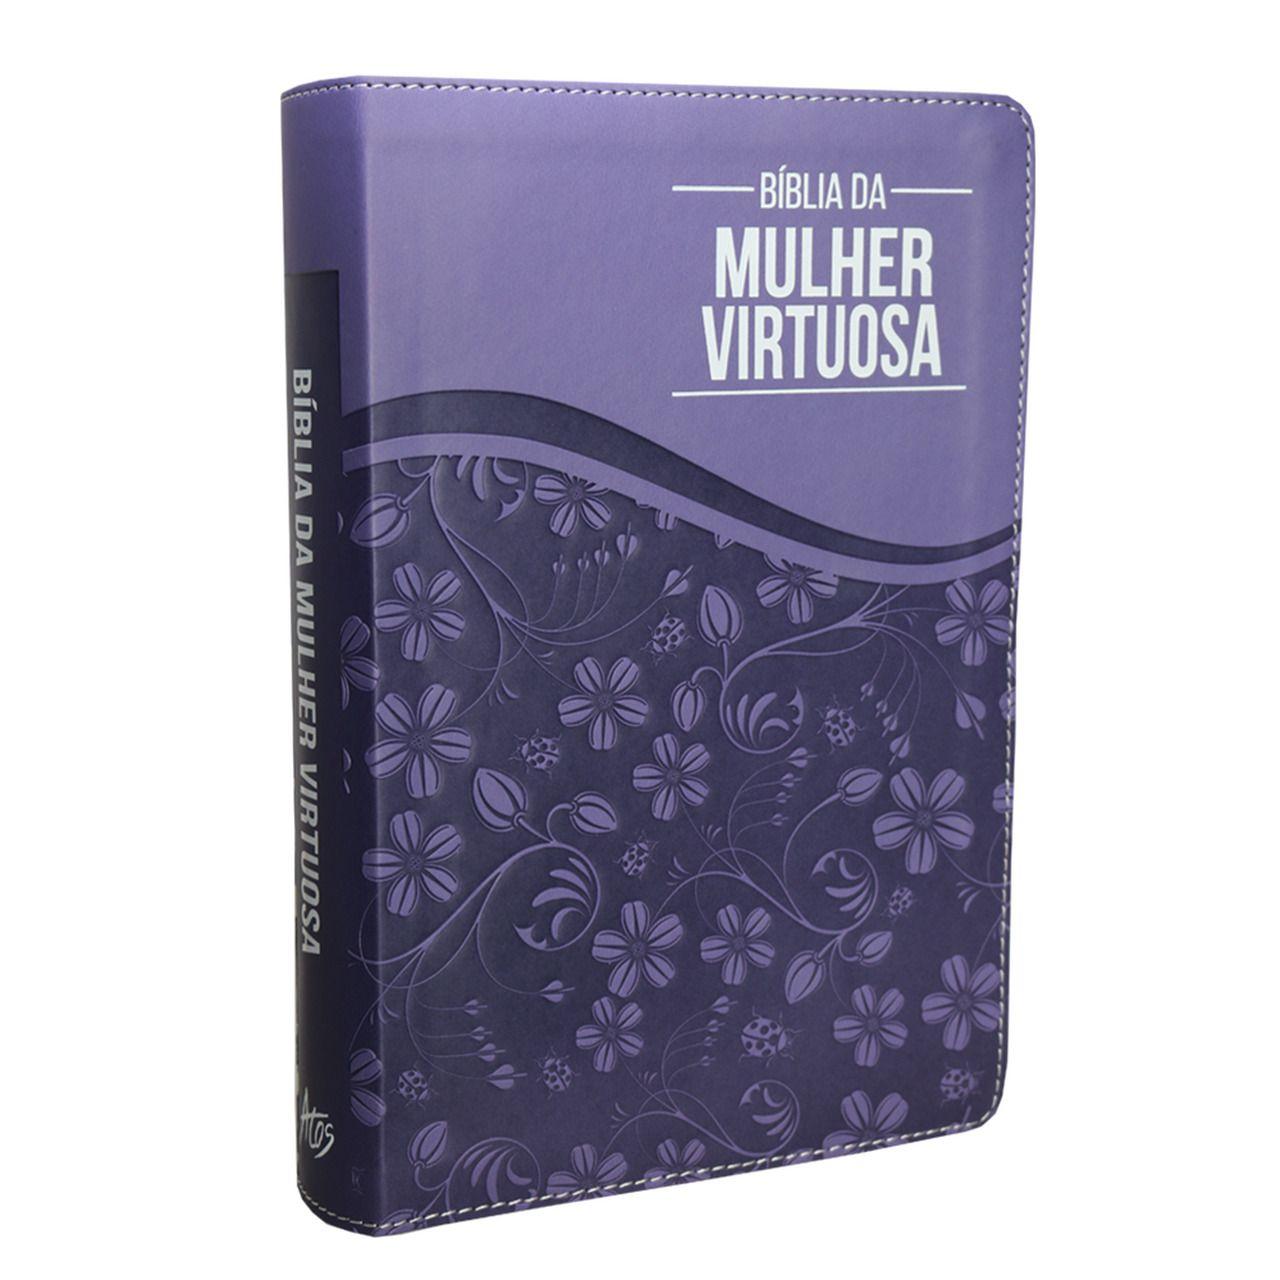 BÍBLIA DA MULHER VIRTUOSA